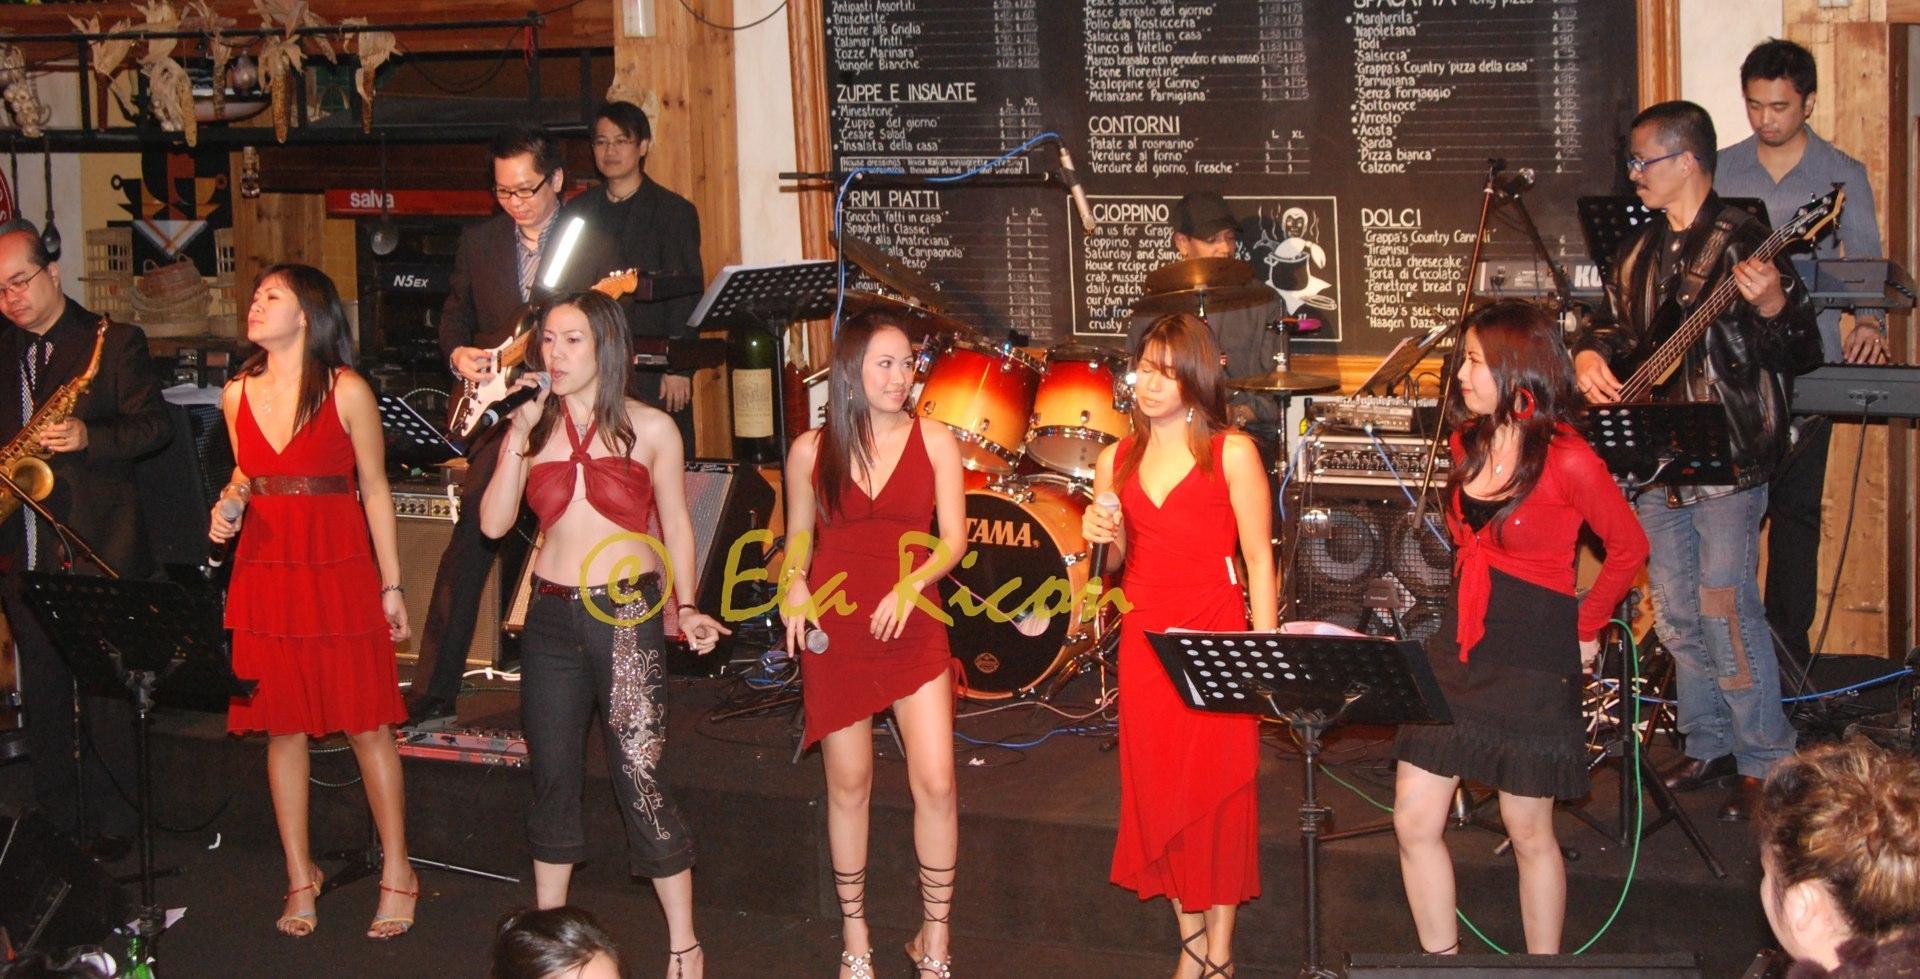 Ela Alegre - My Funky Valentine 2007